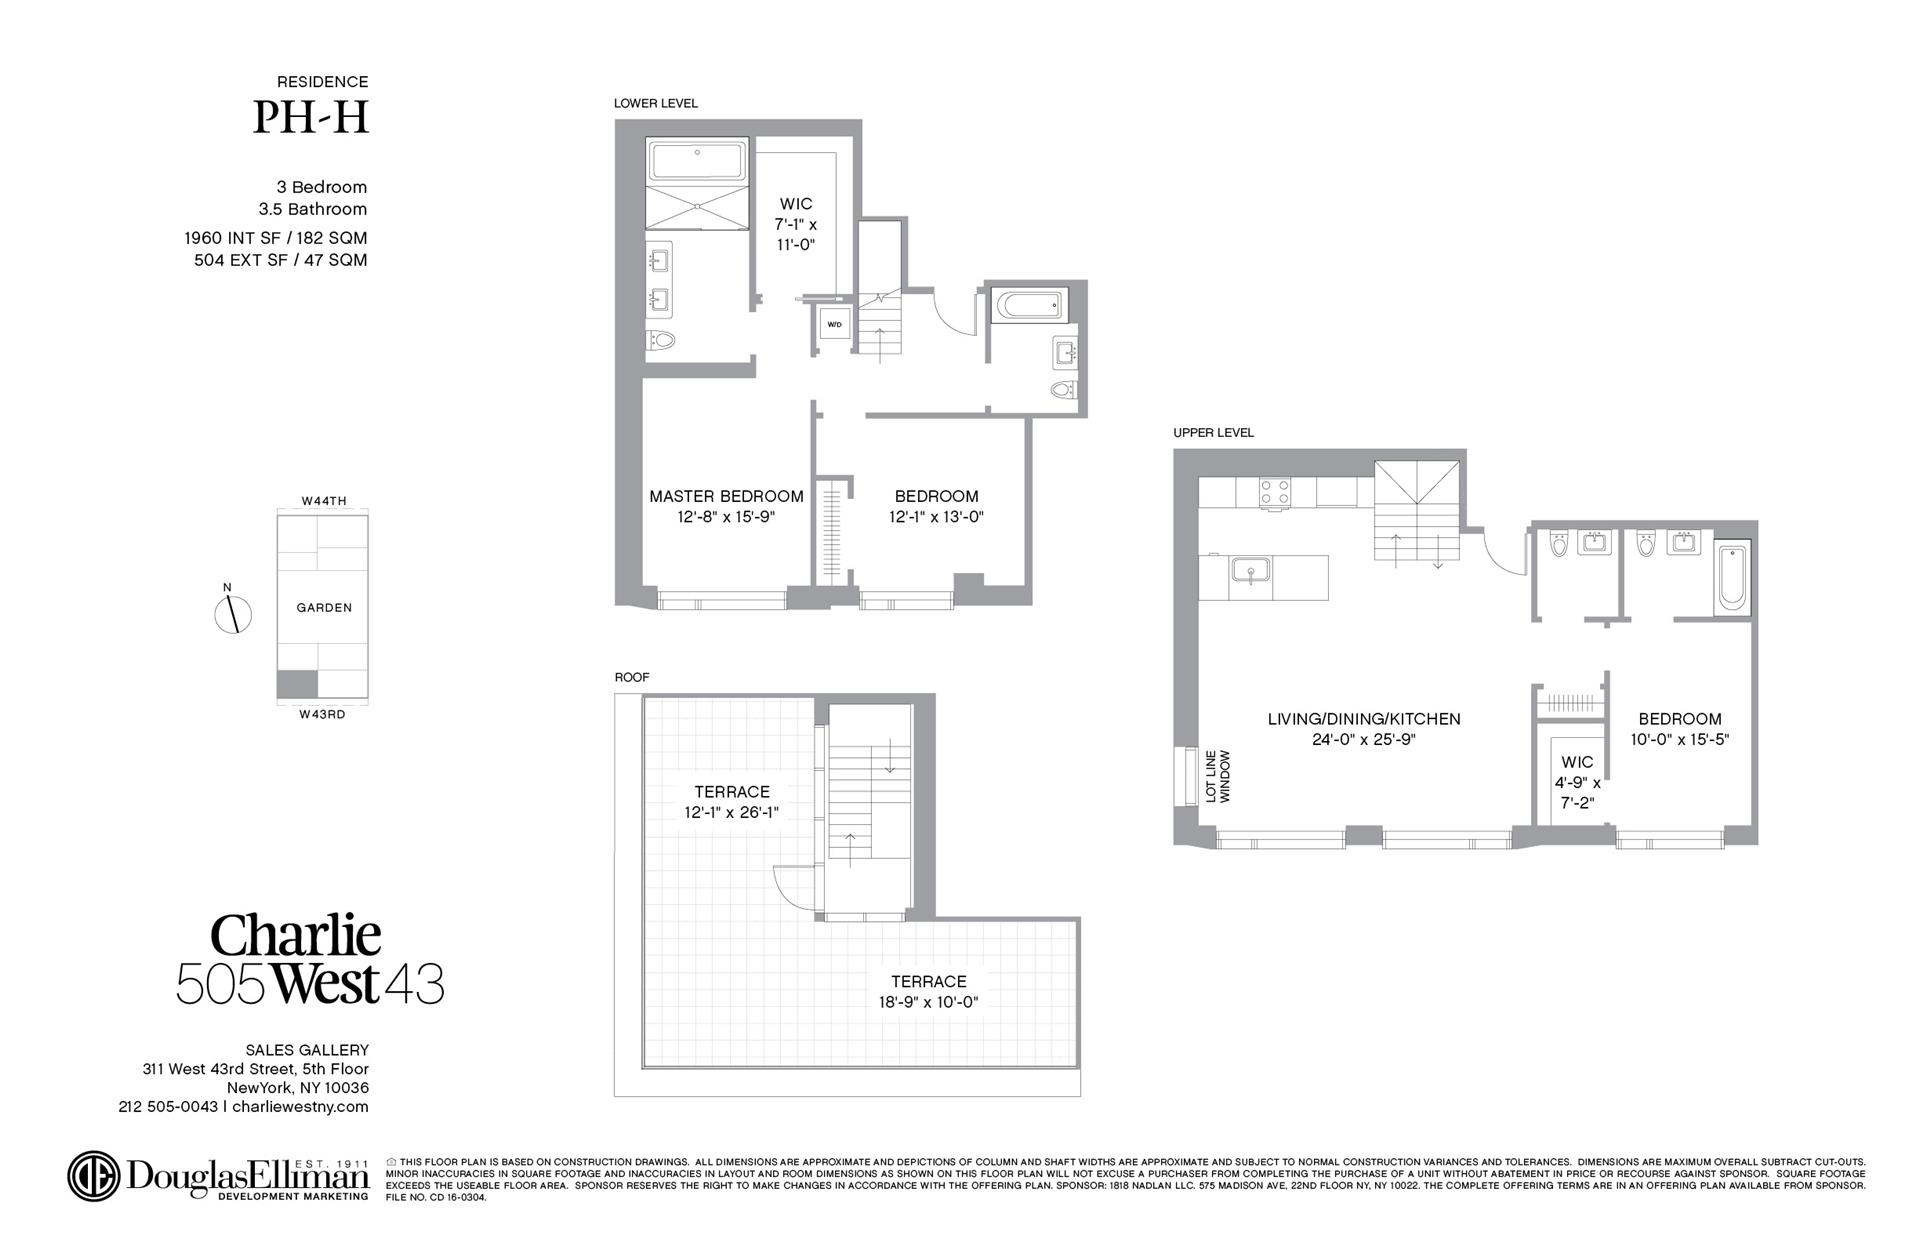 Floor plan of 505 West 43rd St, PHH - Clinton, New York